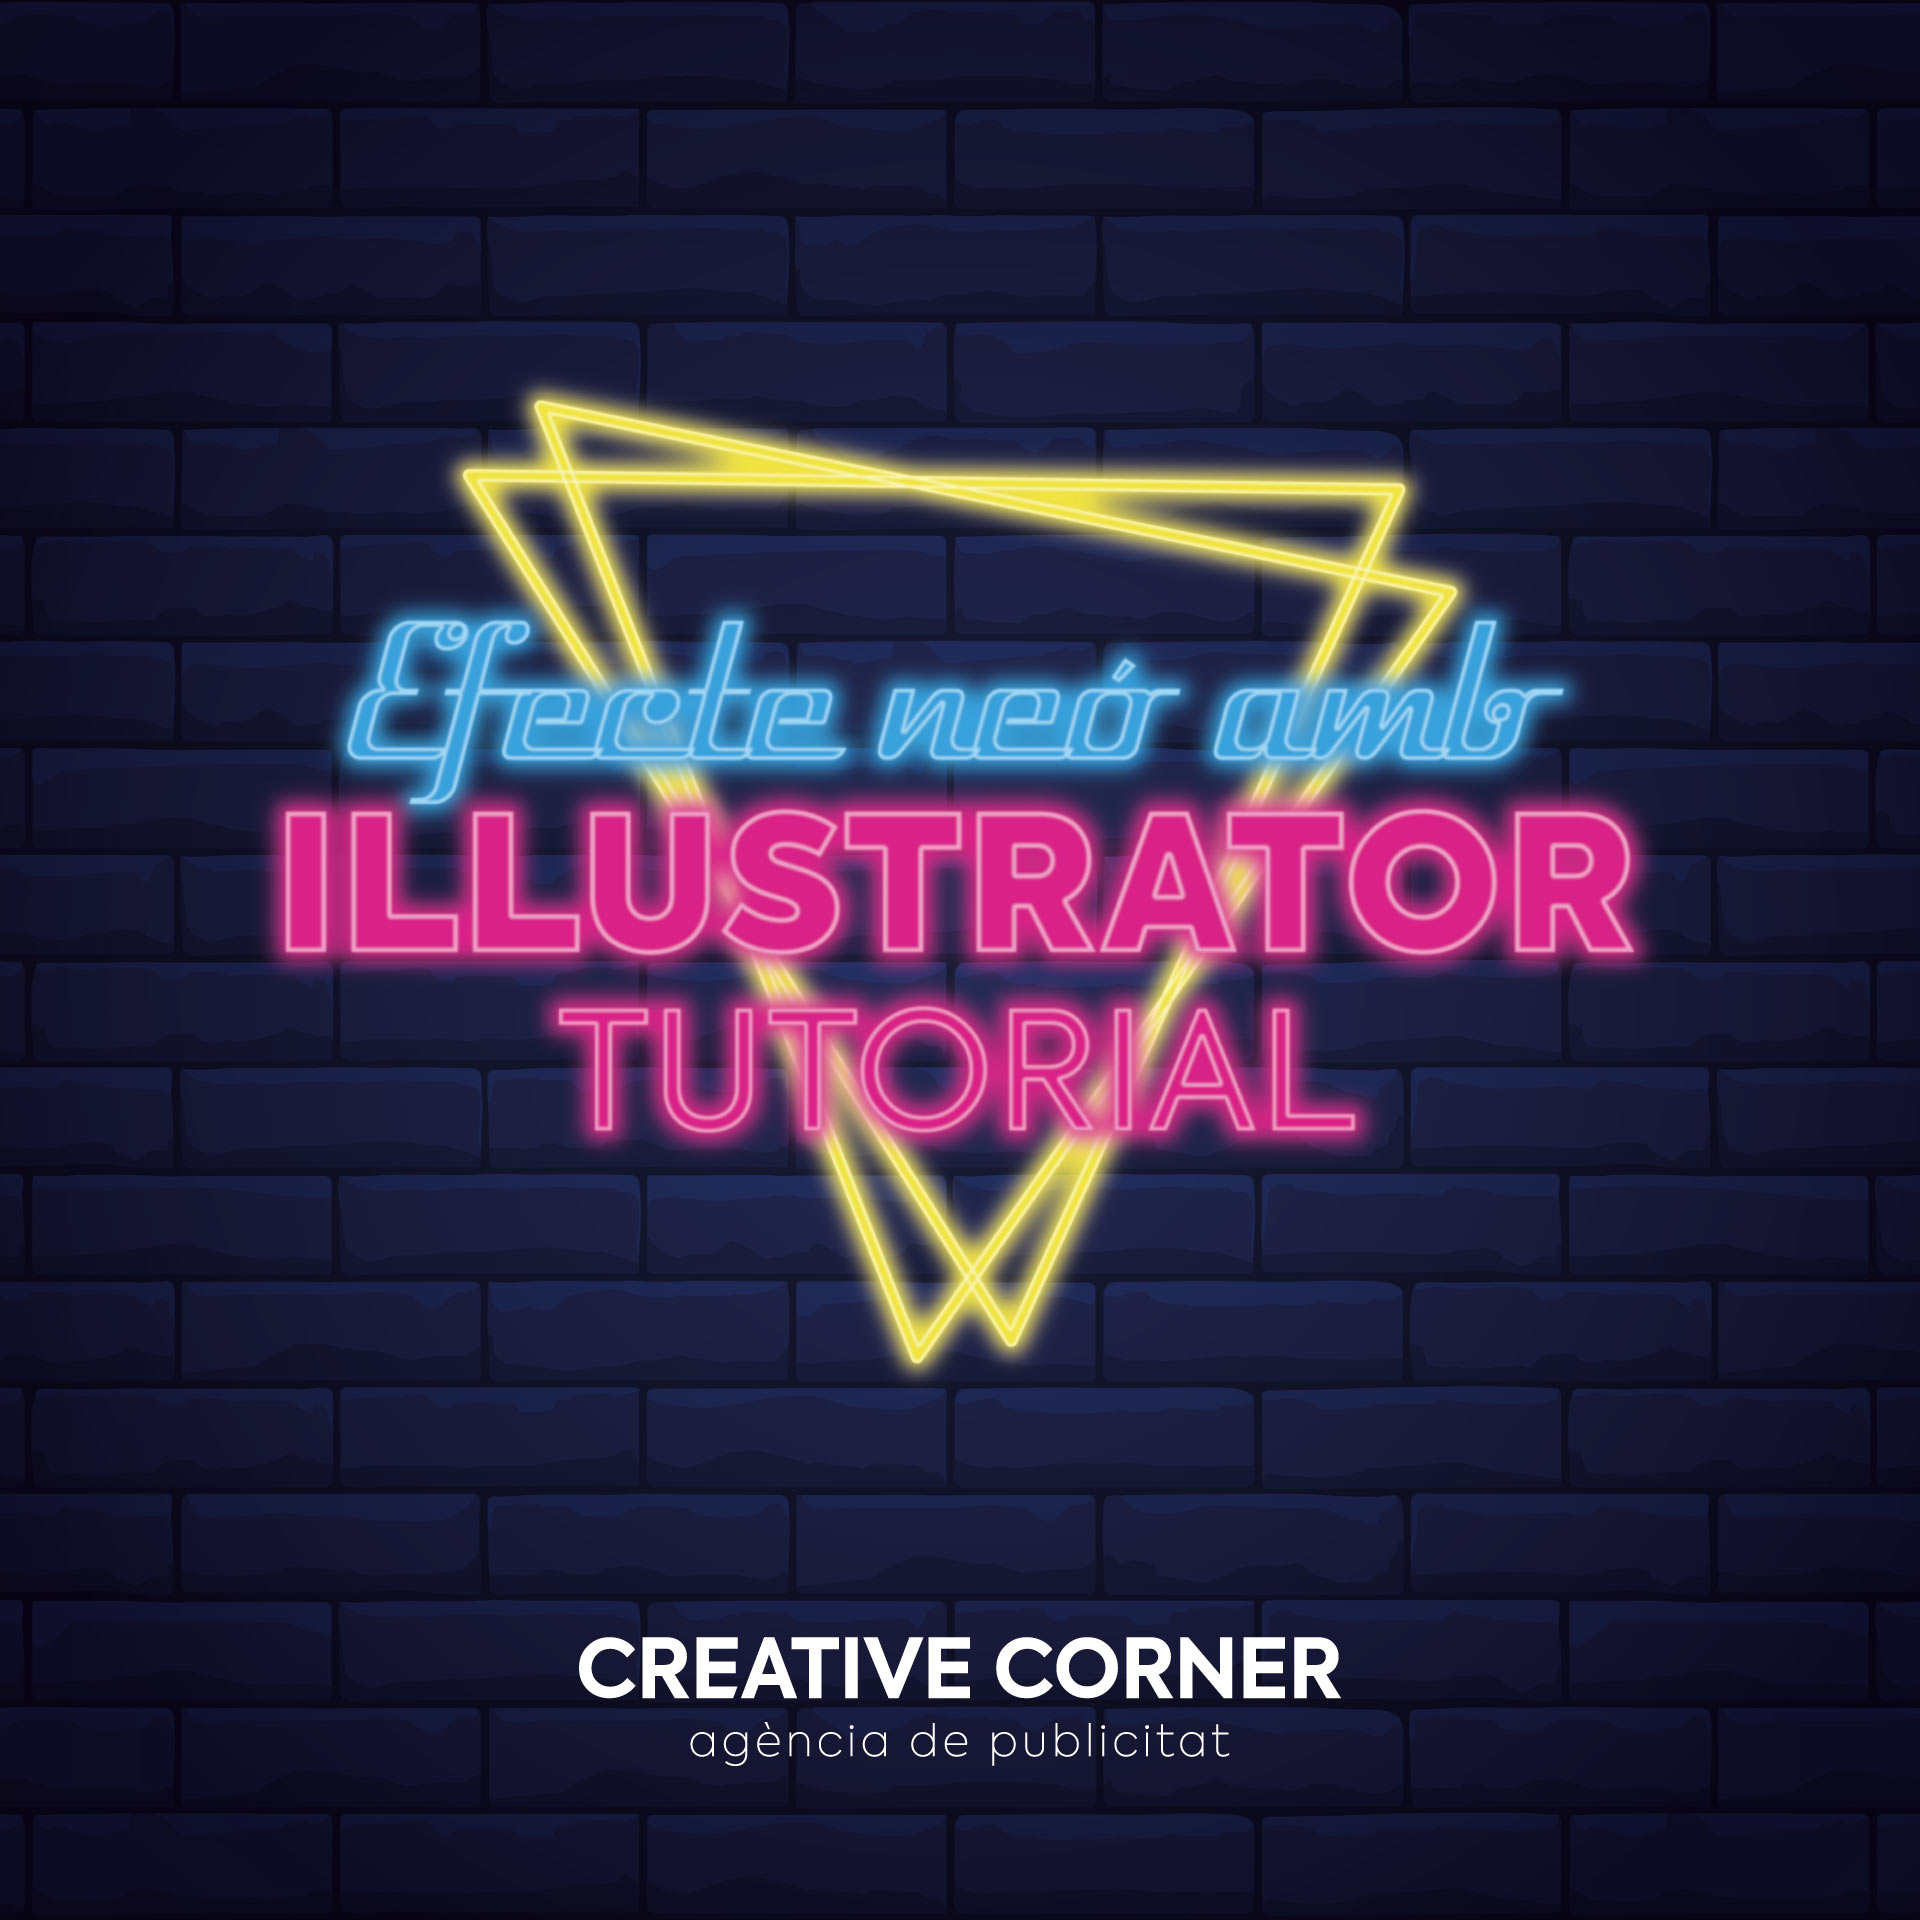 Efecte neó amb Illustrator